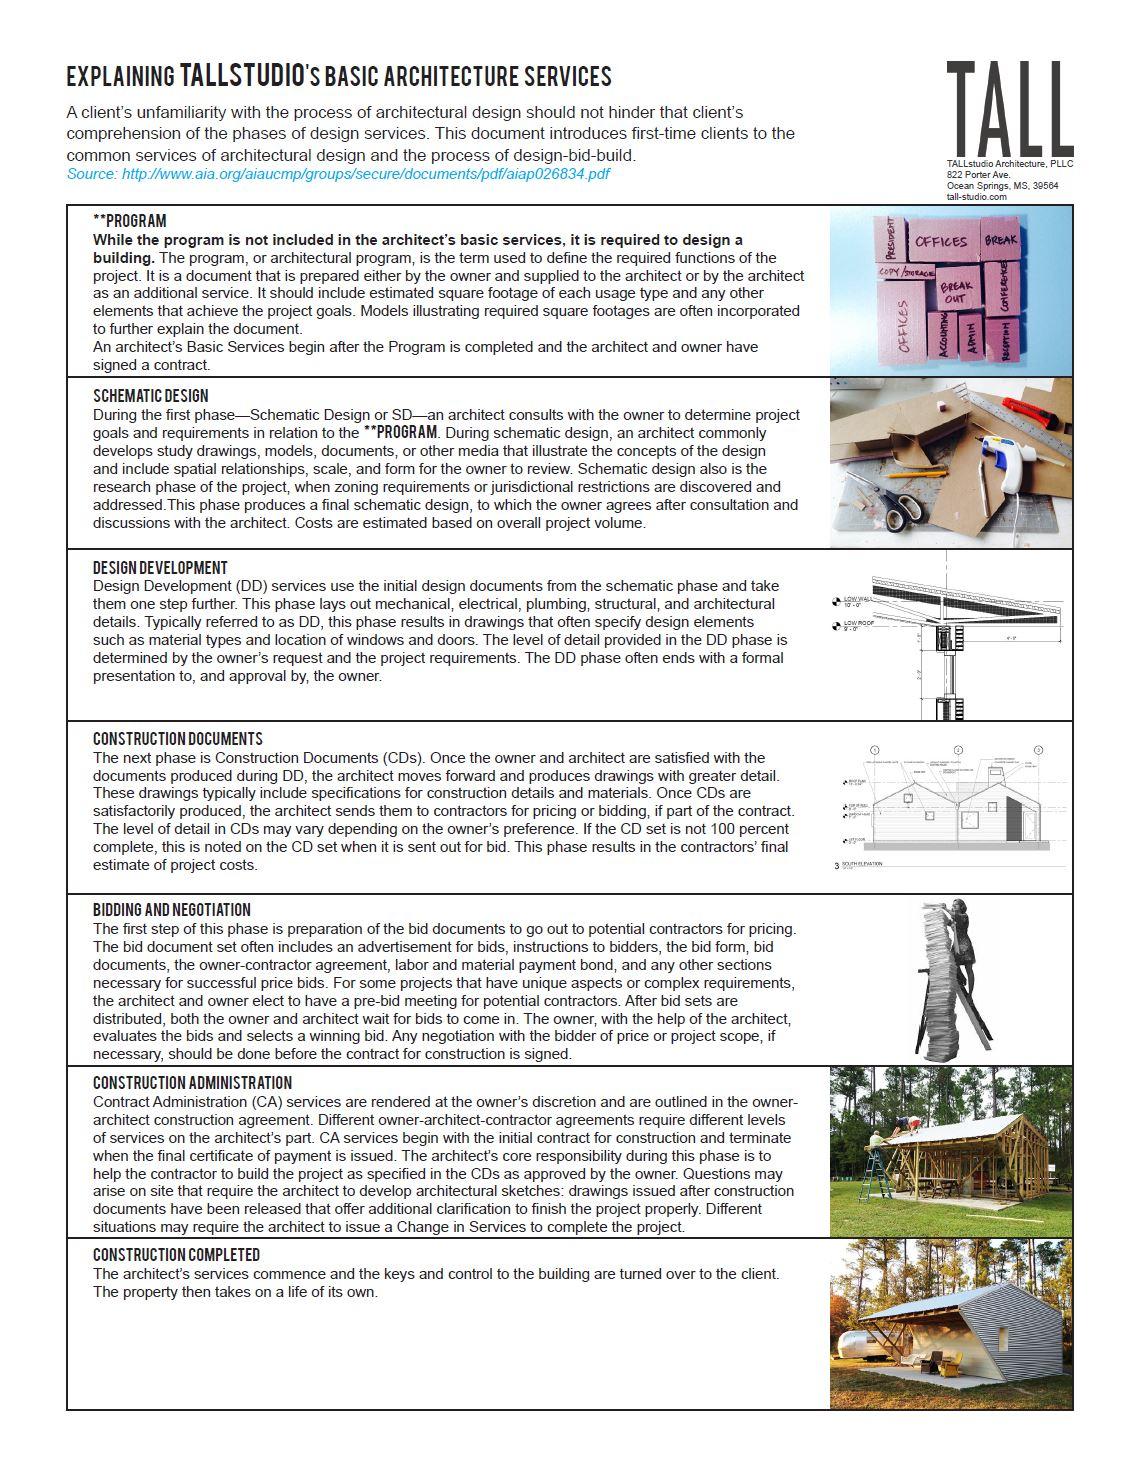 TALLstudio Architecture Design Phases